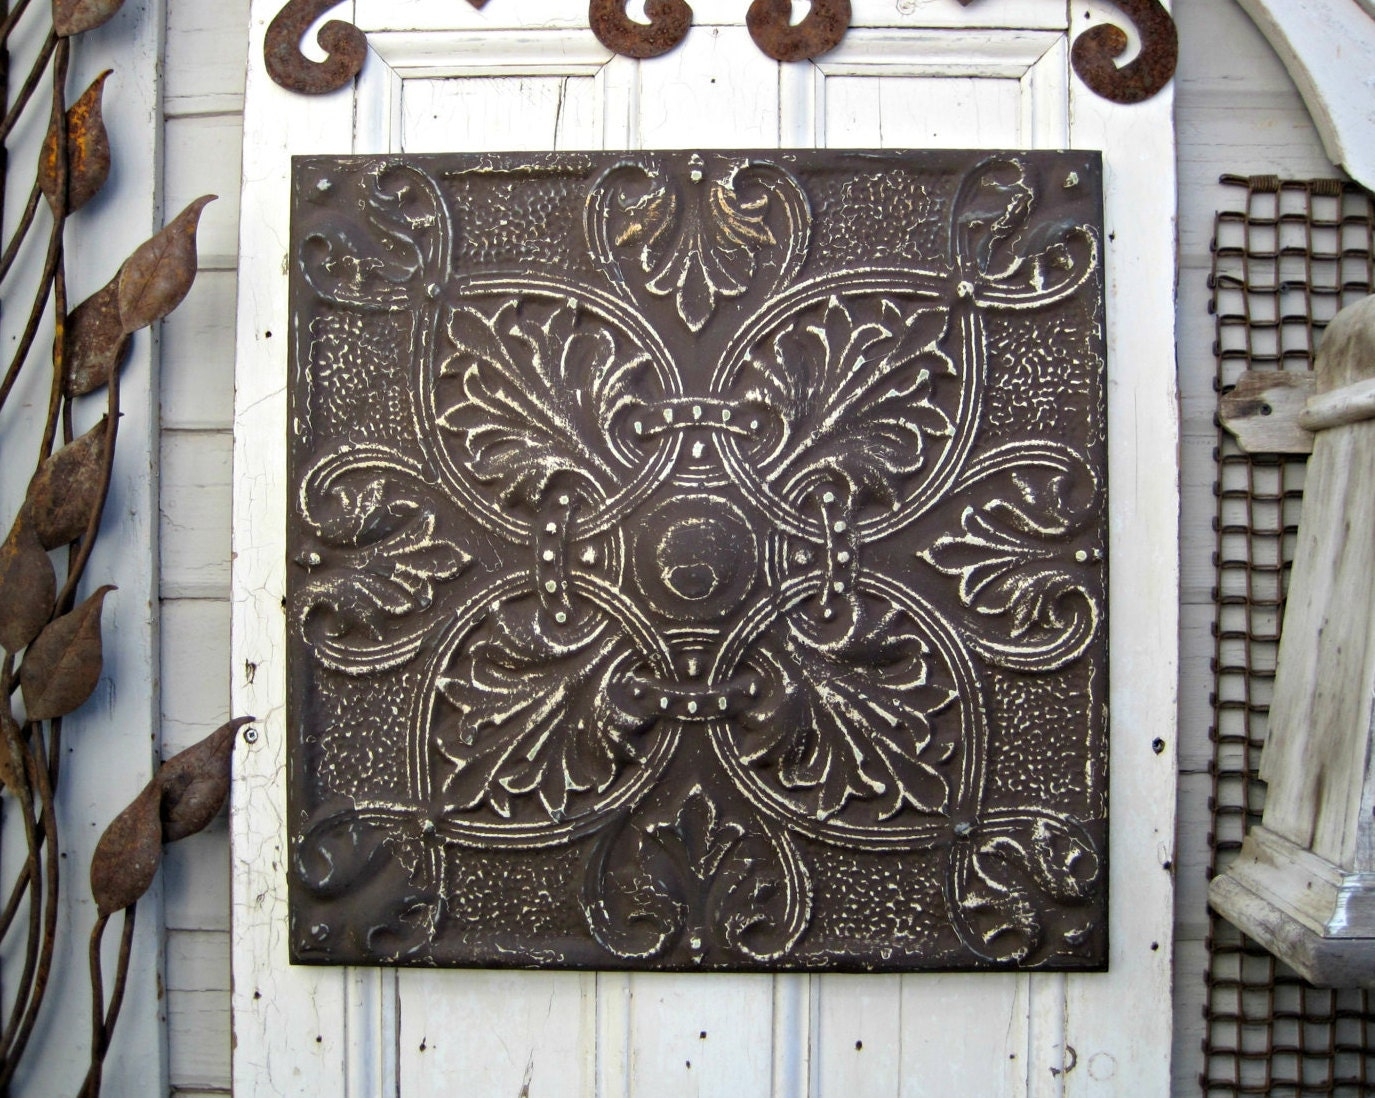 tin ceiling tile antique architectural salvage rustic brown. Black Bedroom Furniture Sets. Home Design Ideas